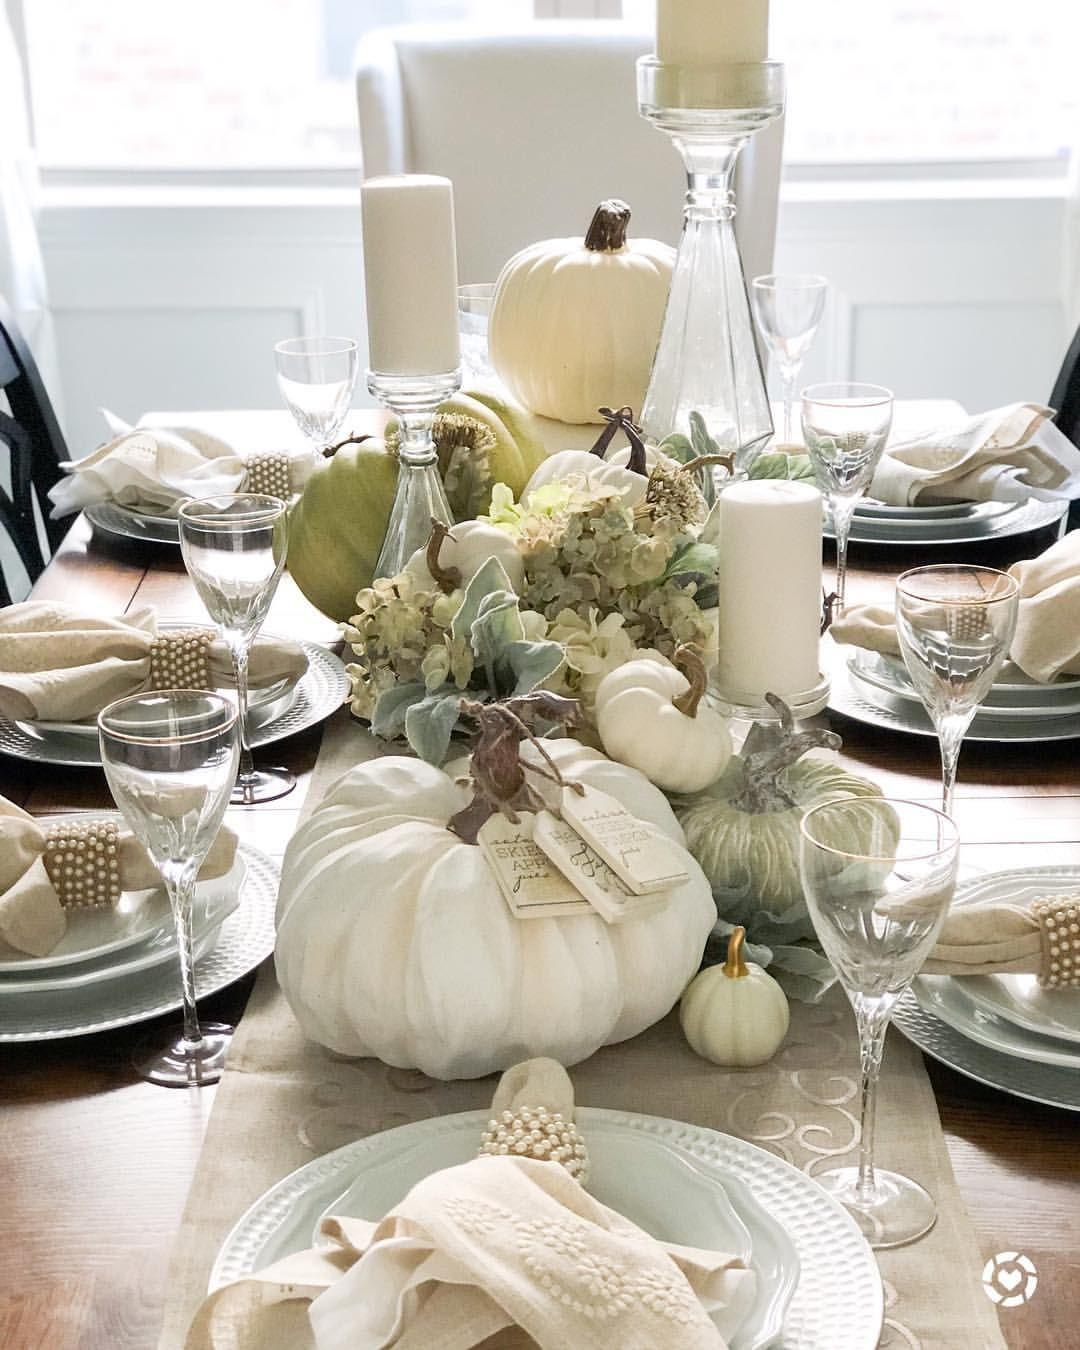 nissa lynn on instagram u201cit was so fun decorating this fall rh pinterest com